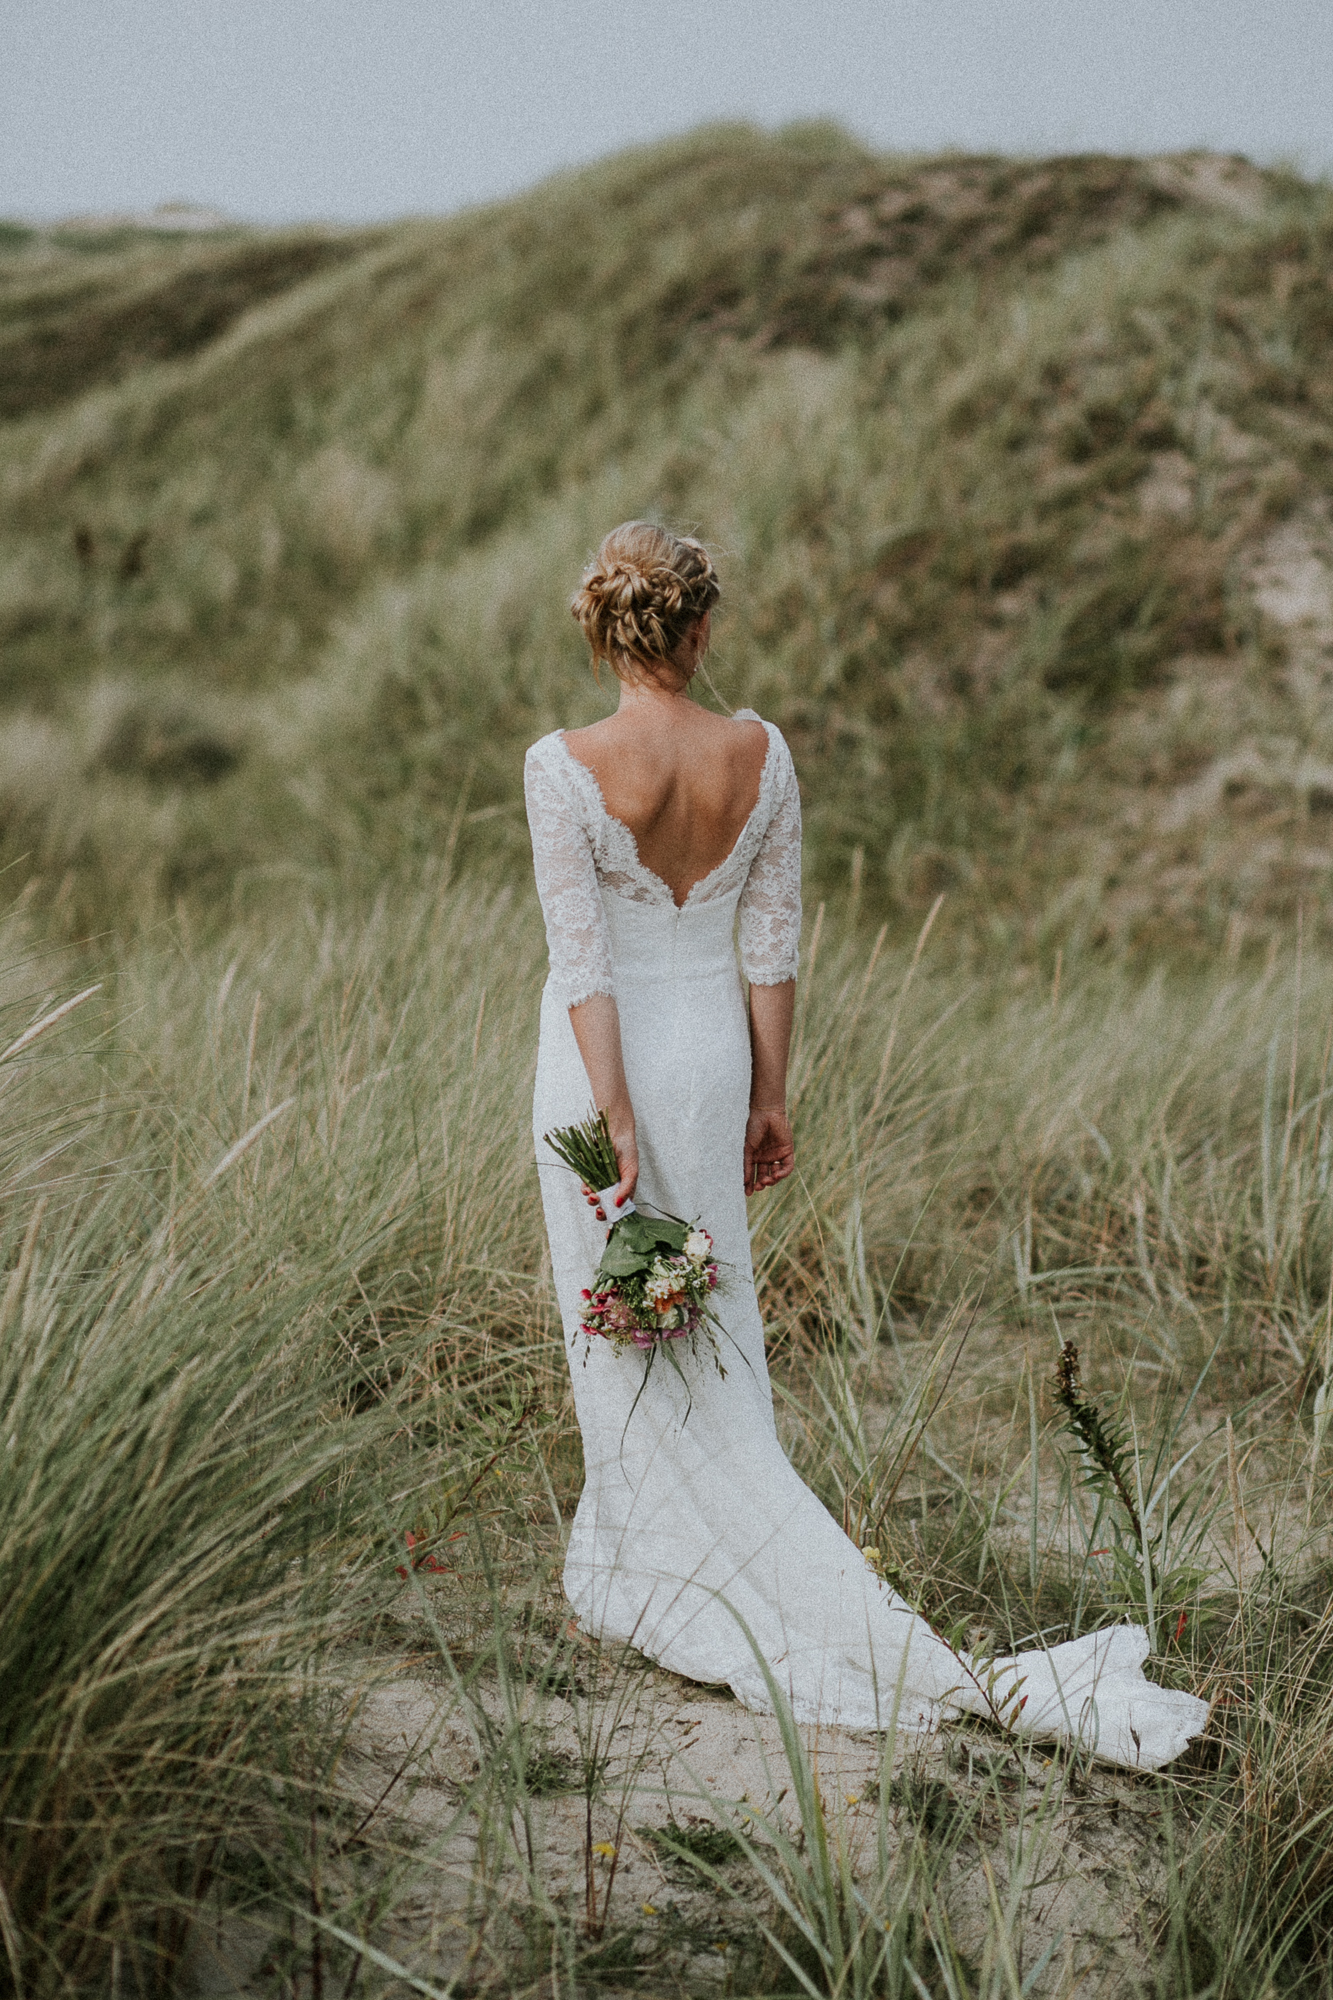 Hochzeitsfotograf Sankt Peter-Ording Alina Atzler